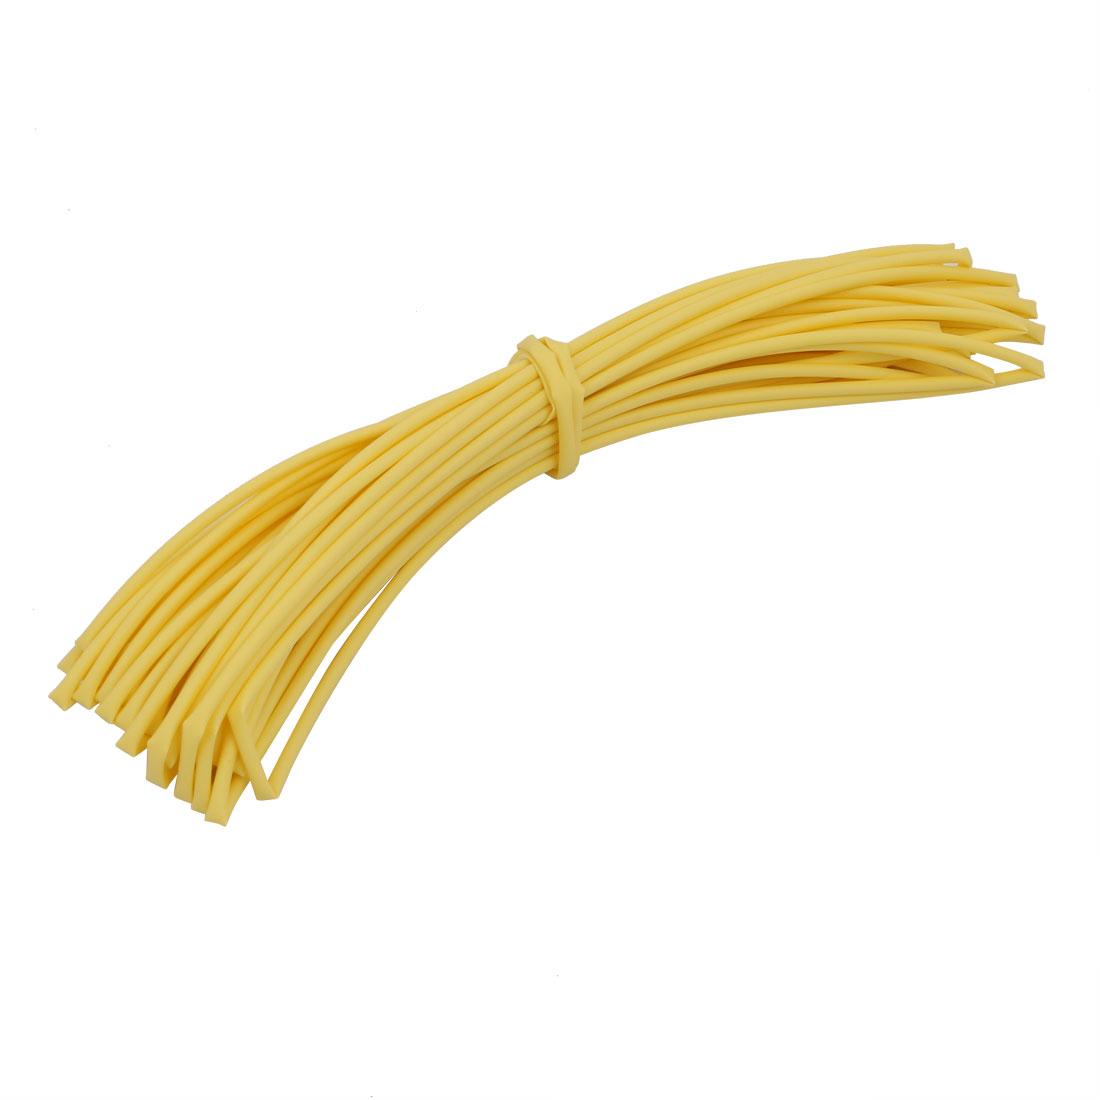 10M 0.06in Inner Dia Polyolefin Flame Retardant Tube Yellow for Wire Repairing